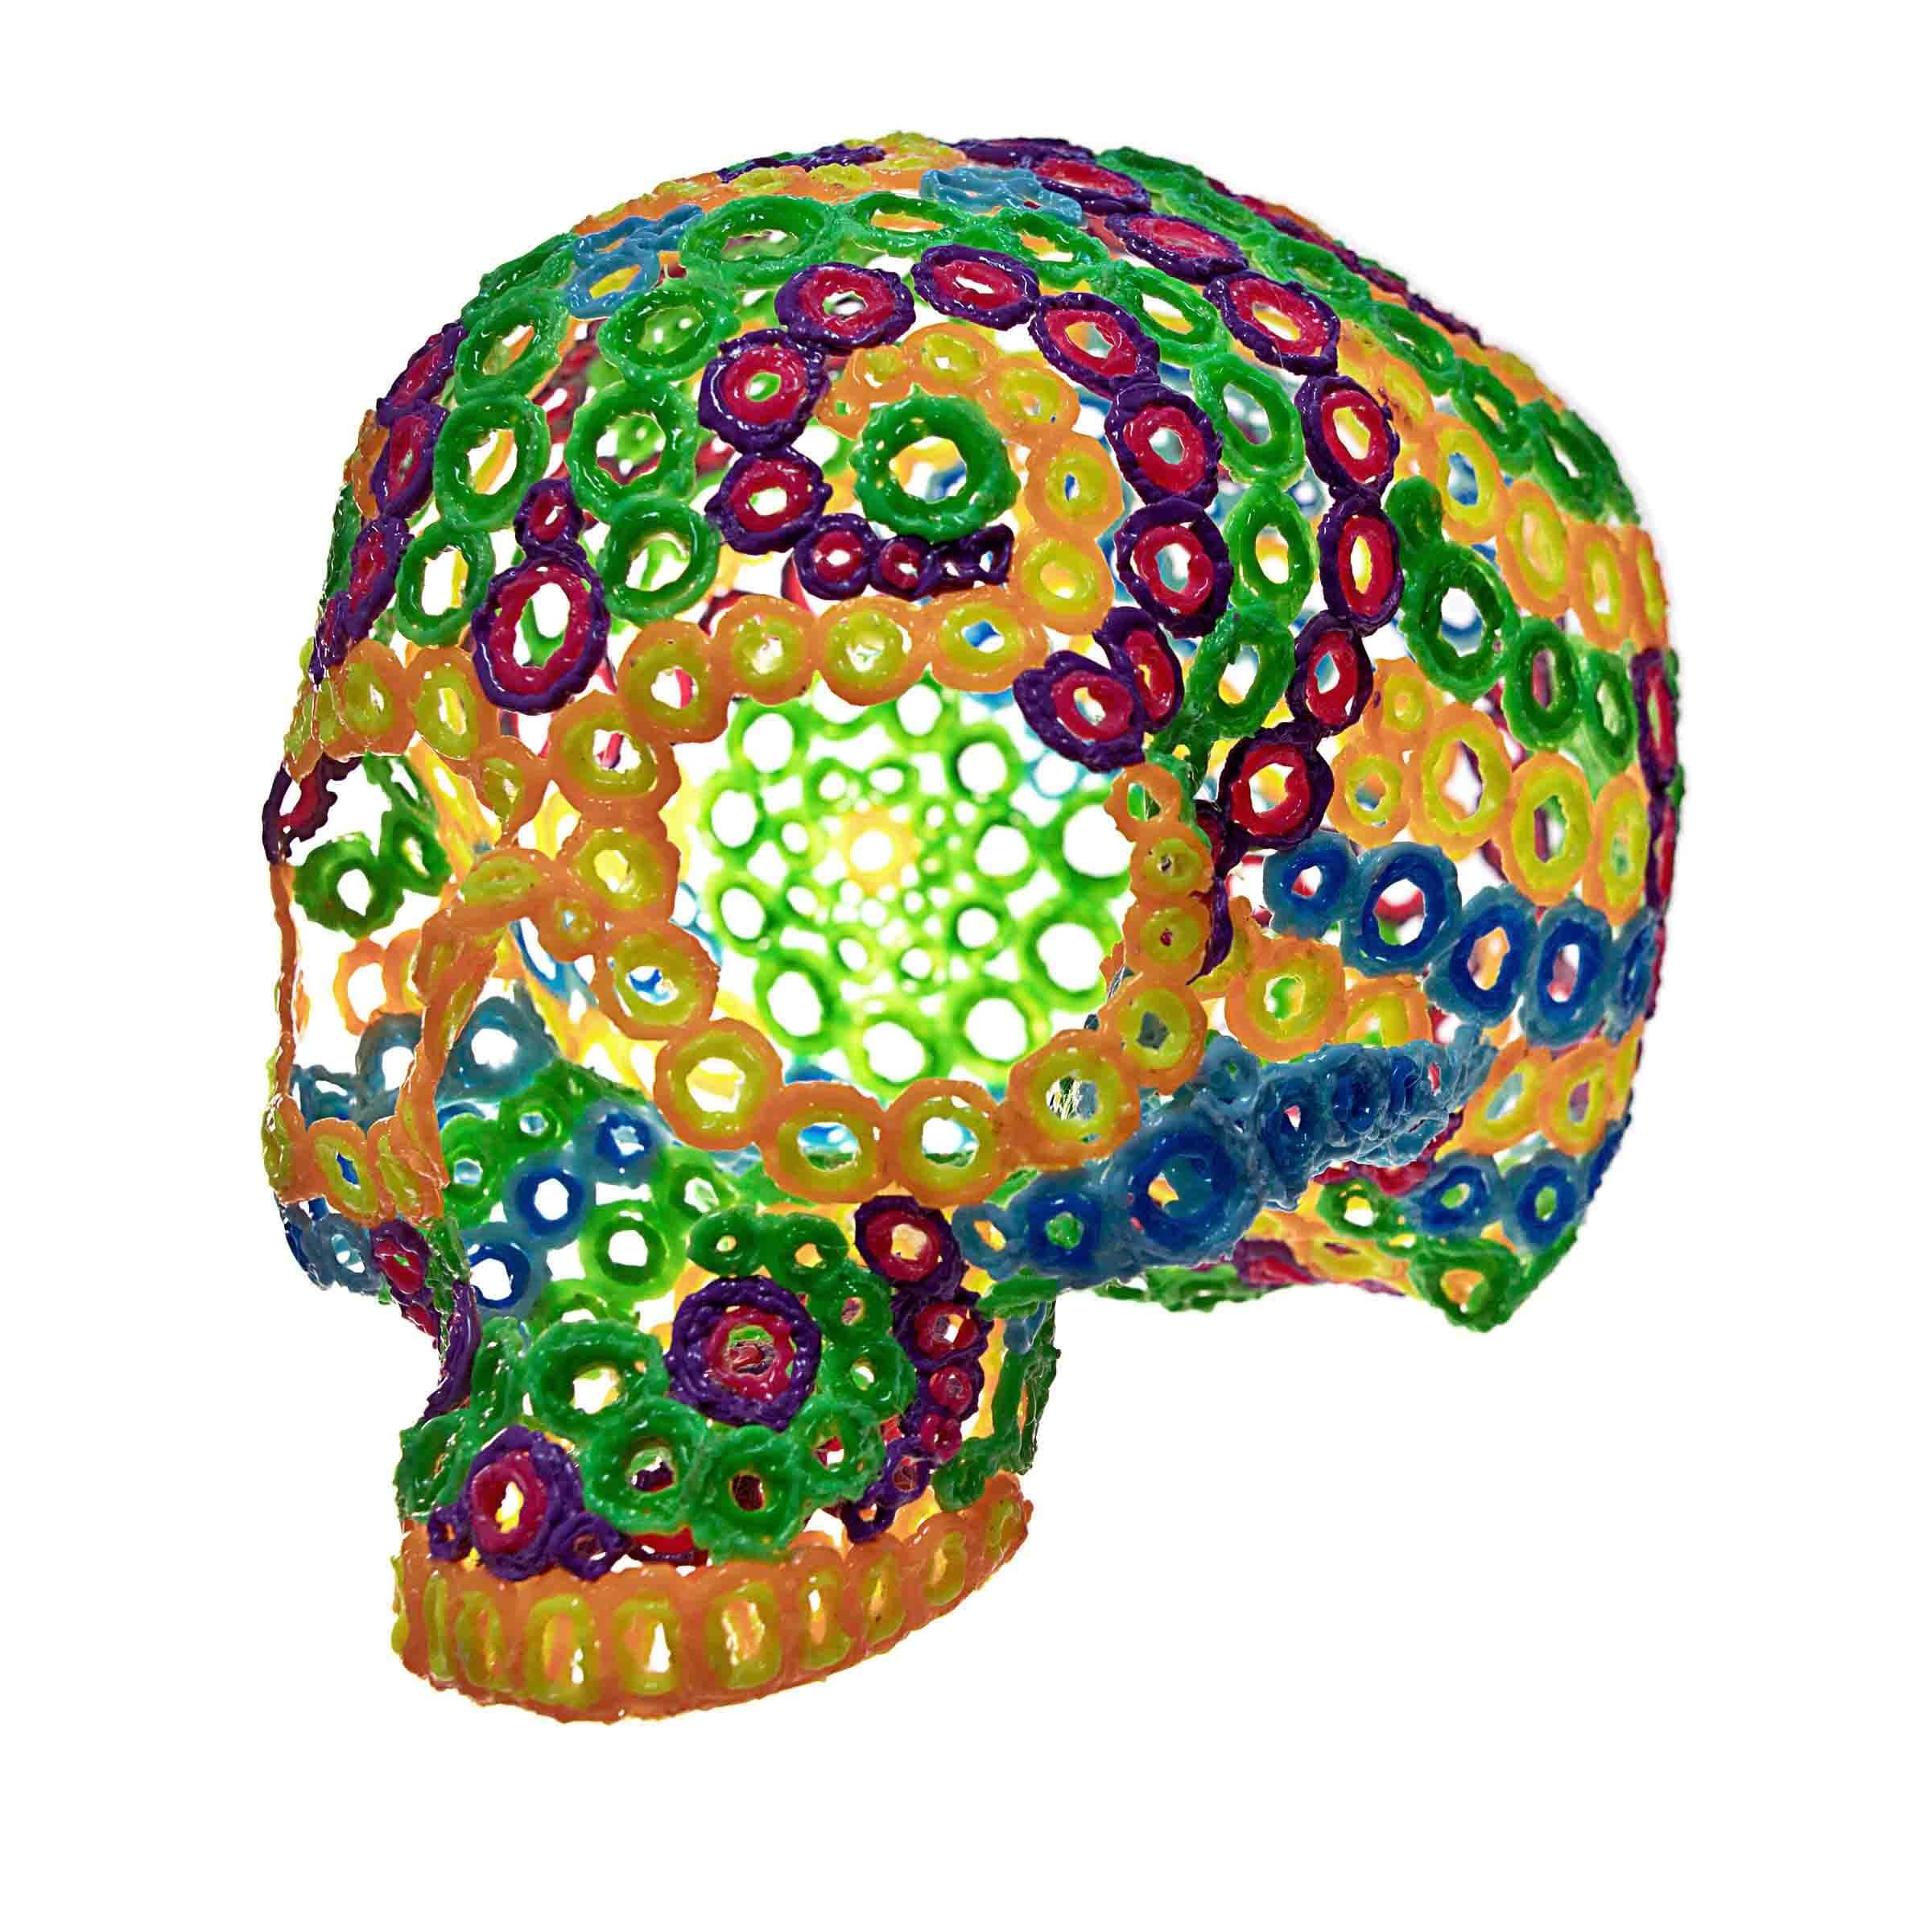 fibonacci skull by Leo Haz